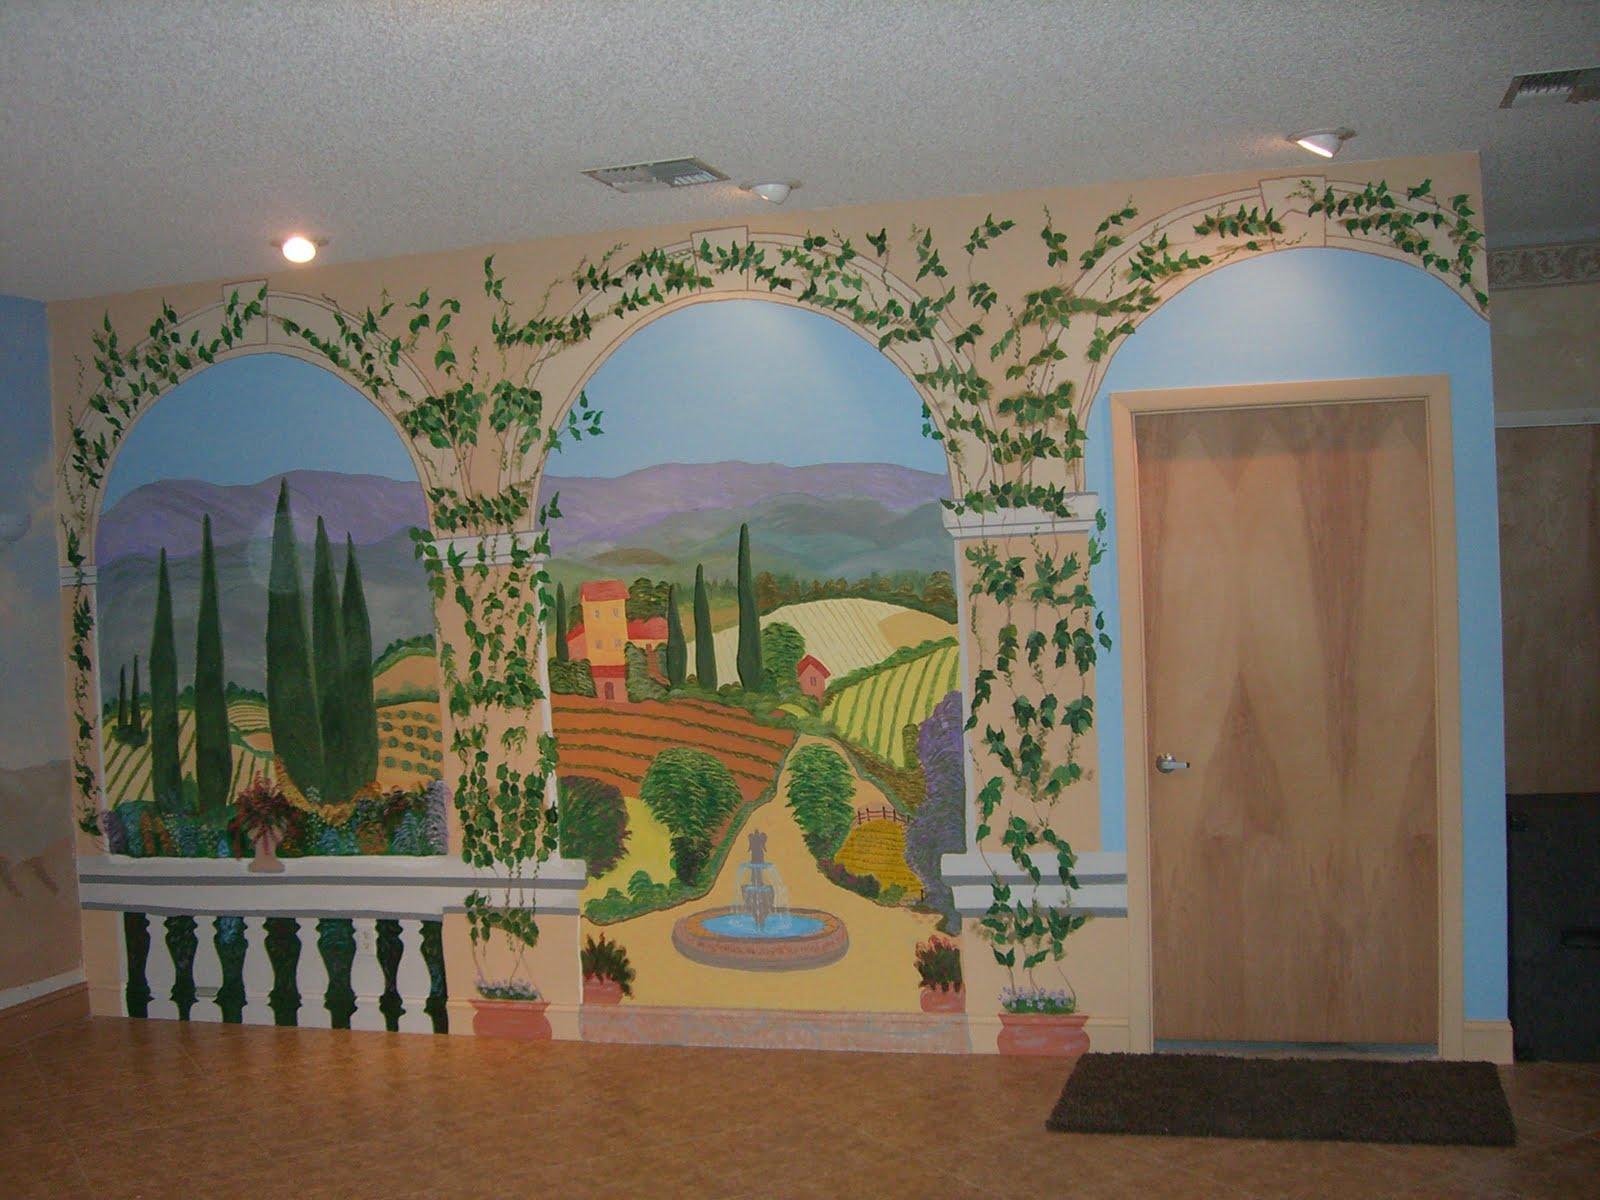 Farmers heart in an urban setting wall mural of 17 39 x 12 for Church wall mural